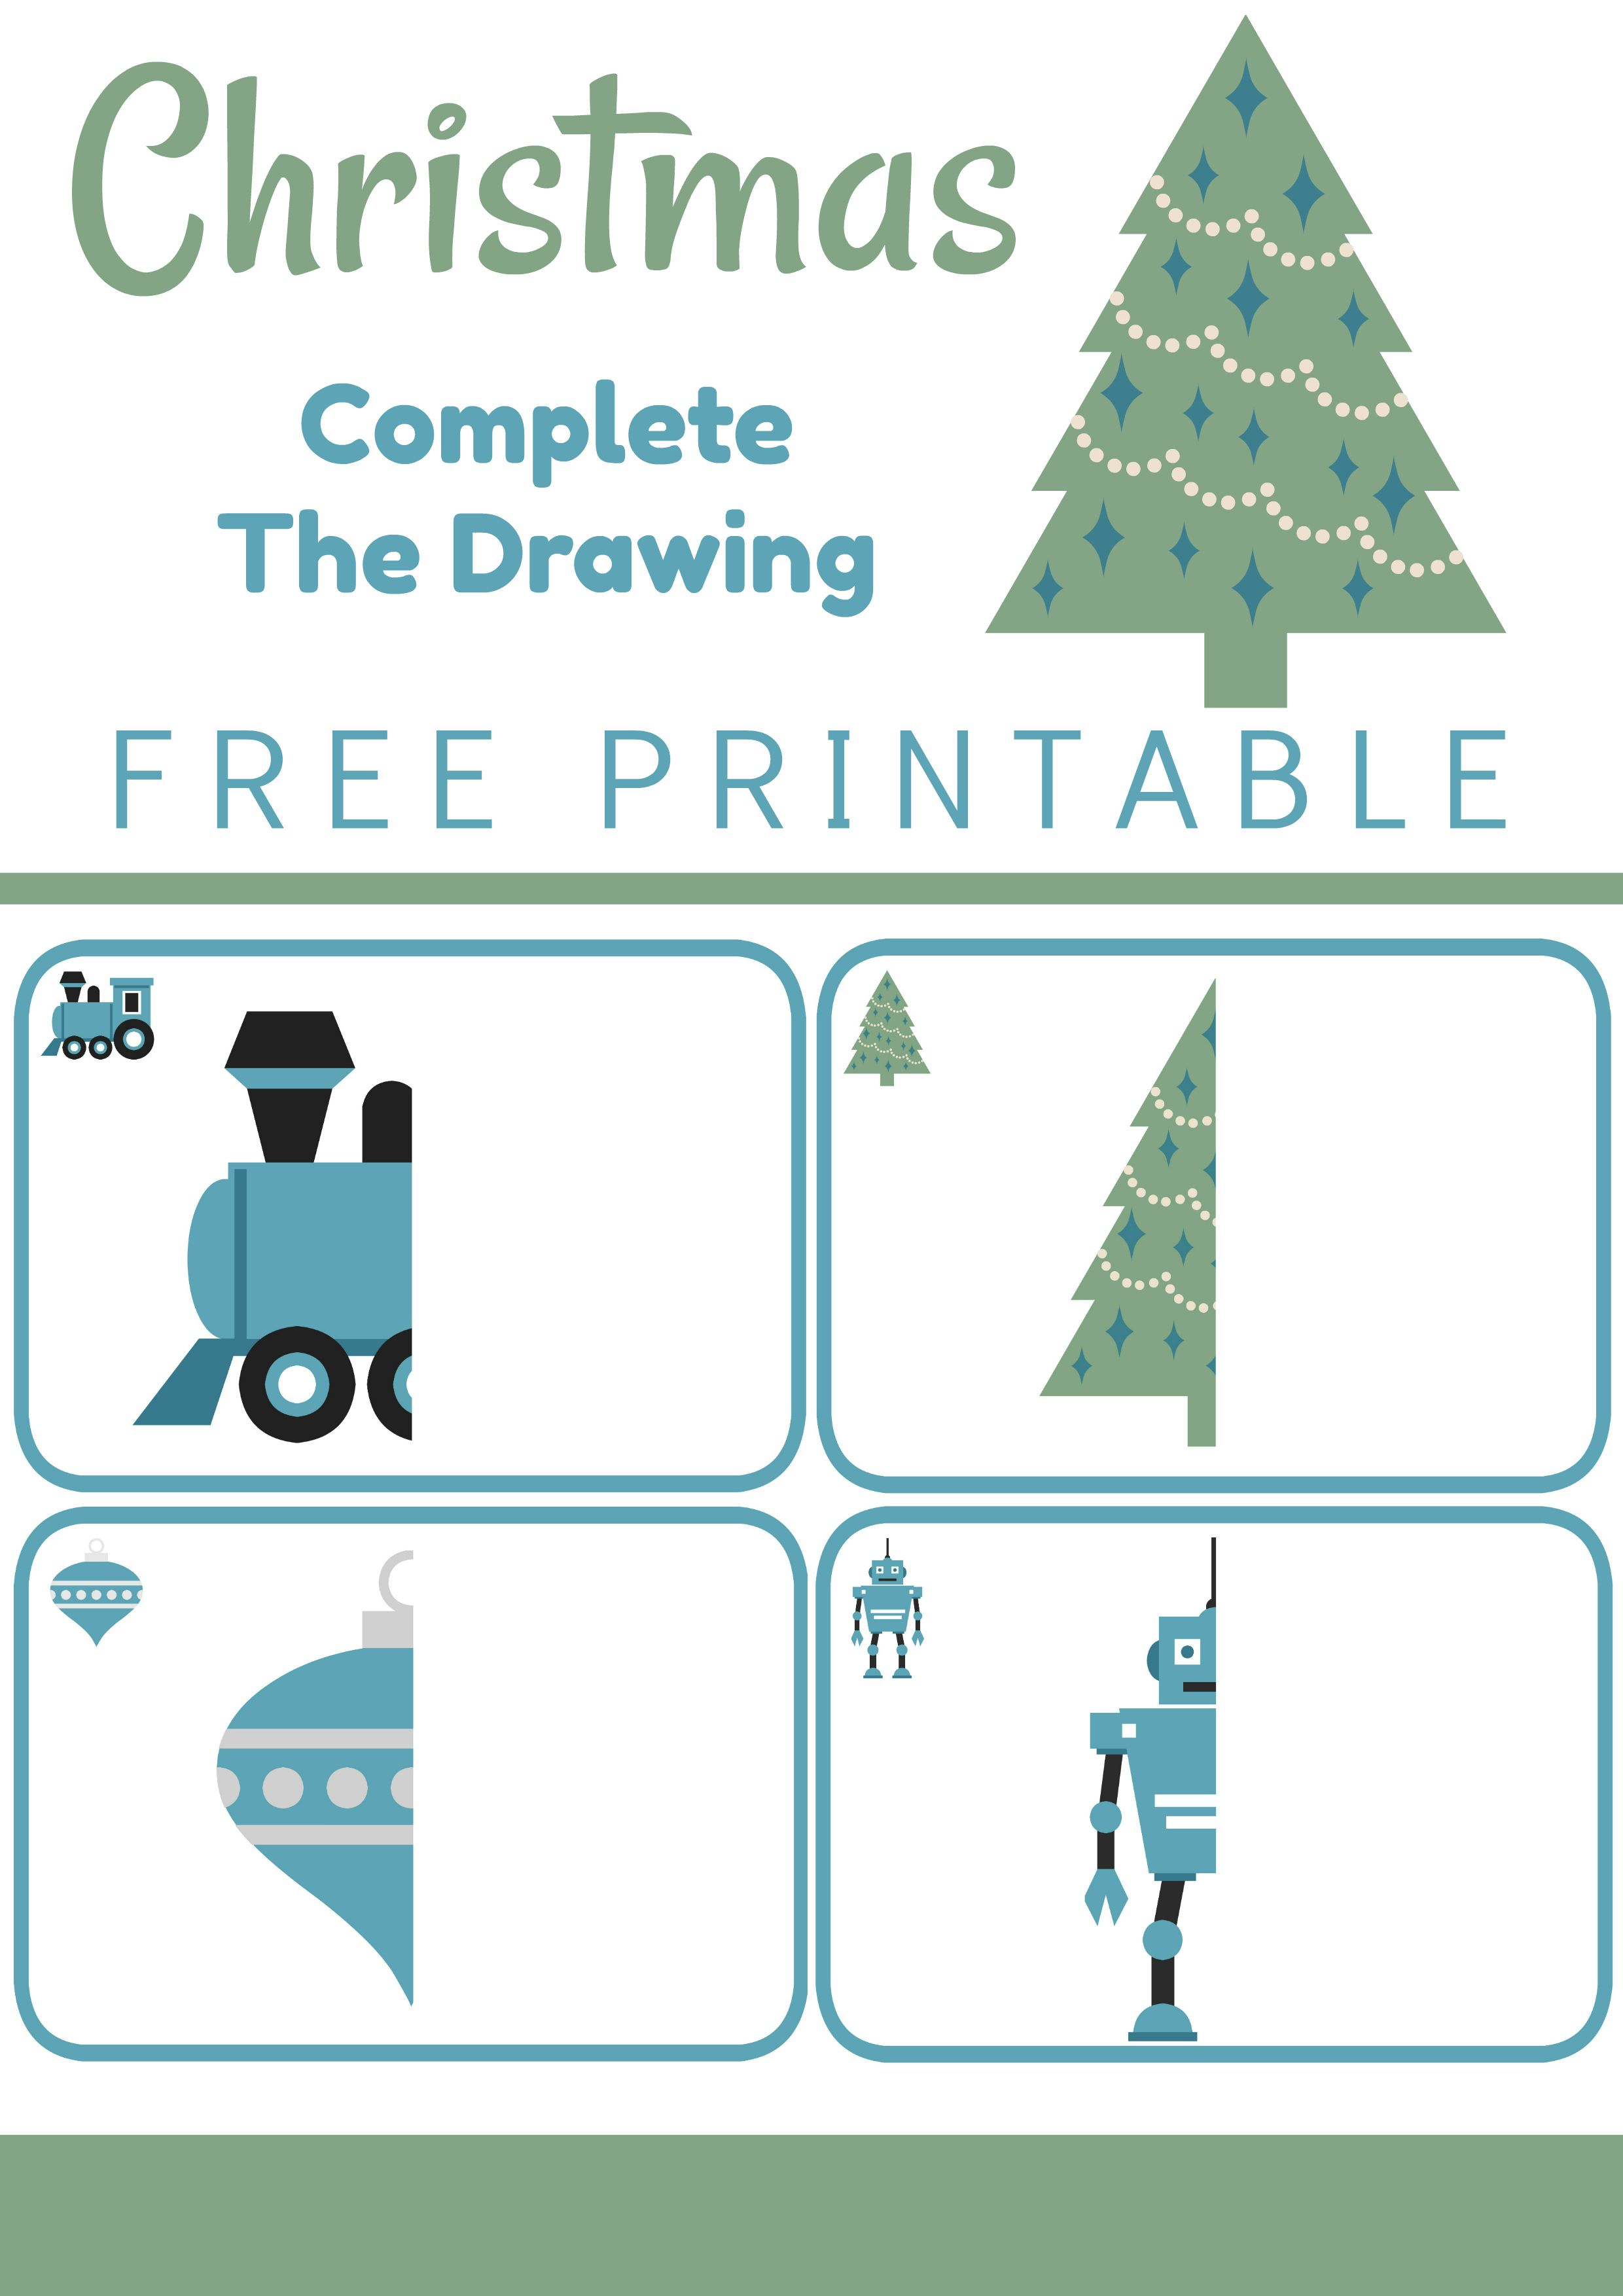 Christmas Complete The Drawing Printable